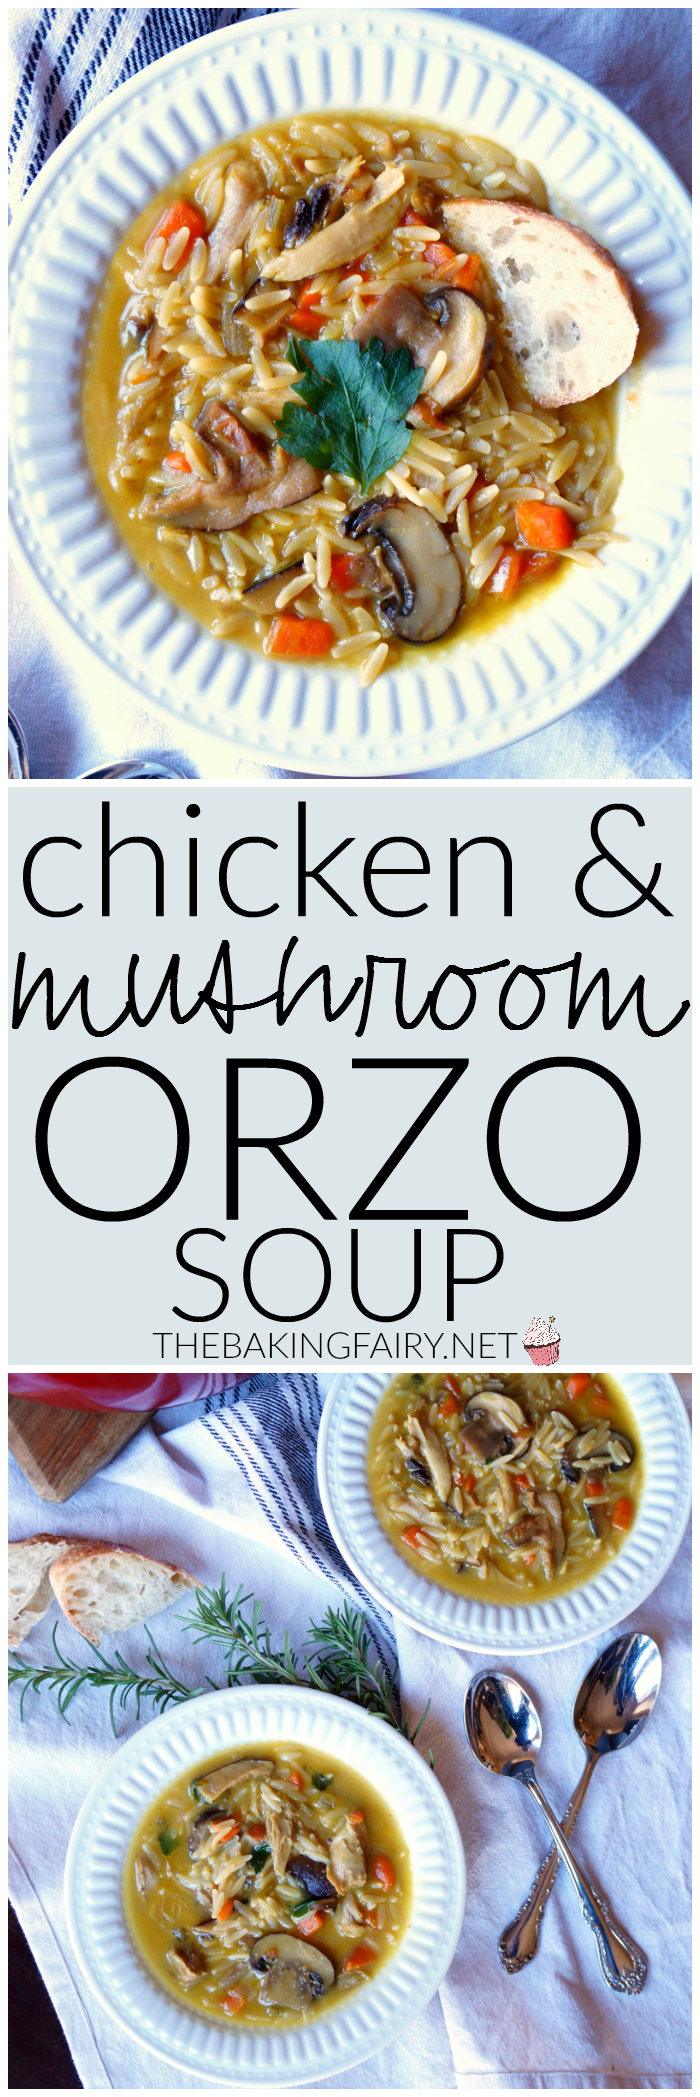 chicken mushroom orzo soup | The Baking Fairy